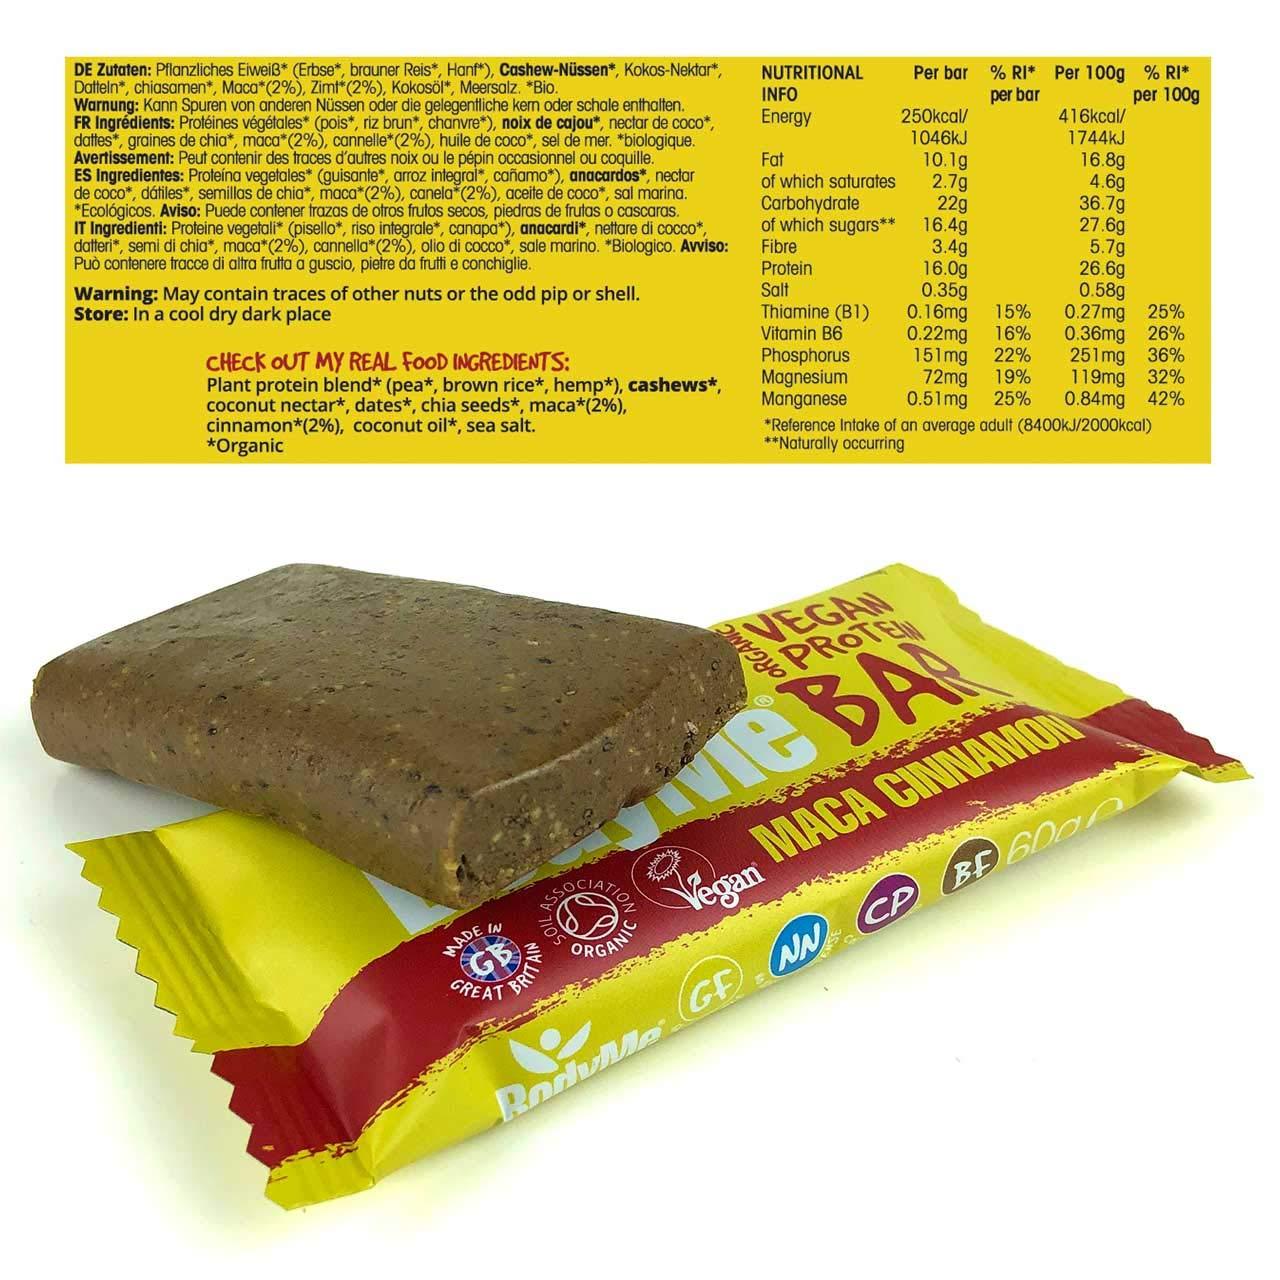 BodyMe Barritas Proteinas Veganas Organica | Cruda Maca Canela | 12 x 60g Barra Proteina Vegana | Sin Gluten | 16g Proteína Completa | 3 Proteina ...